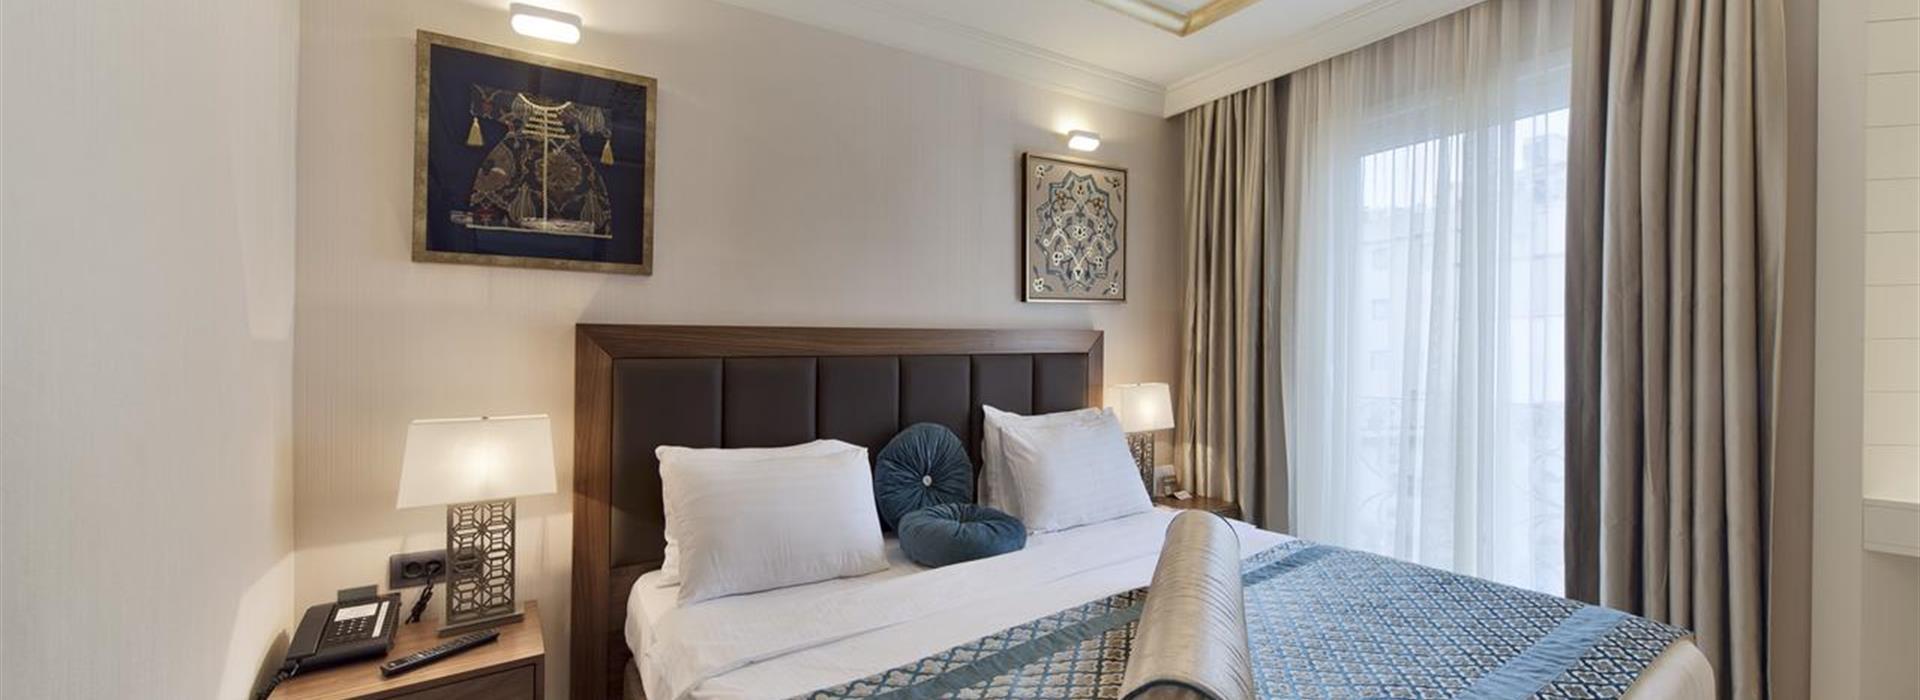 Golden-Age-Hotel